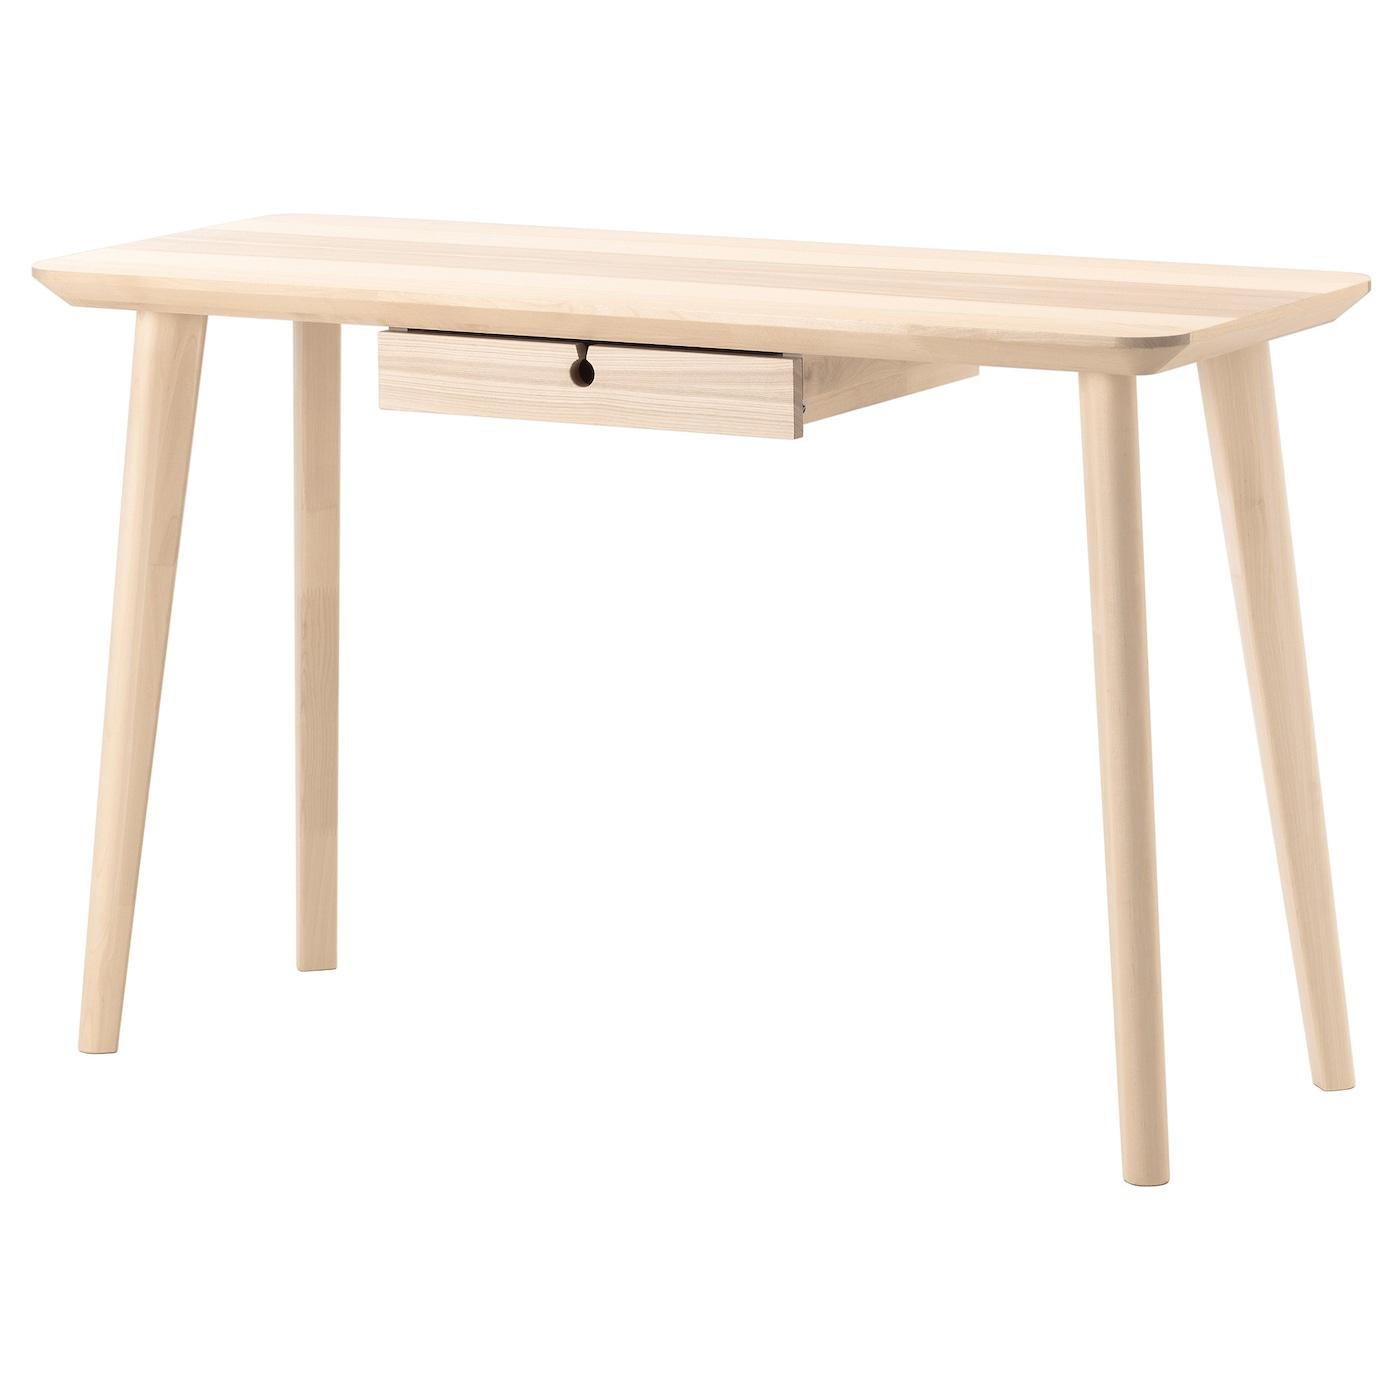 LISABO Desk Ash veneer 118 x 45 cm - IKEA